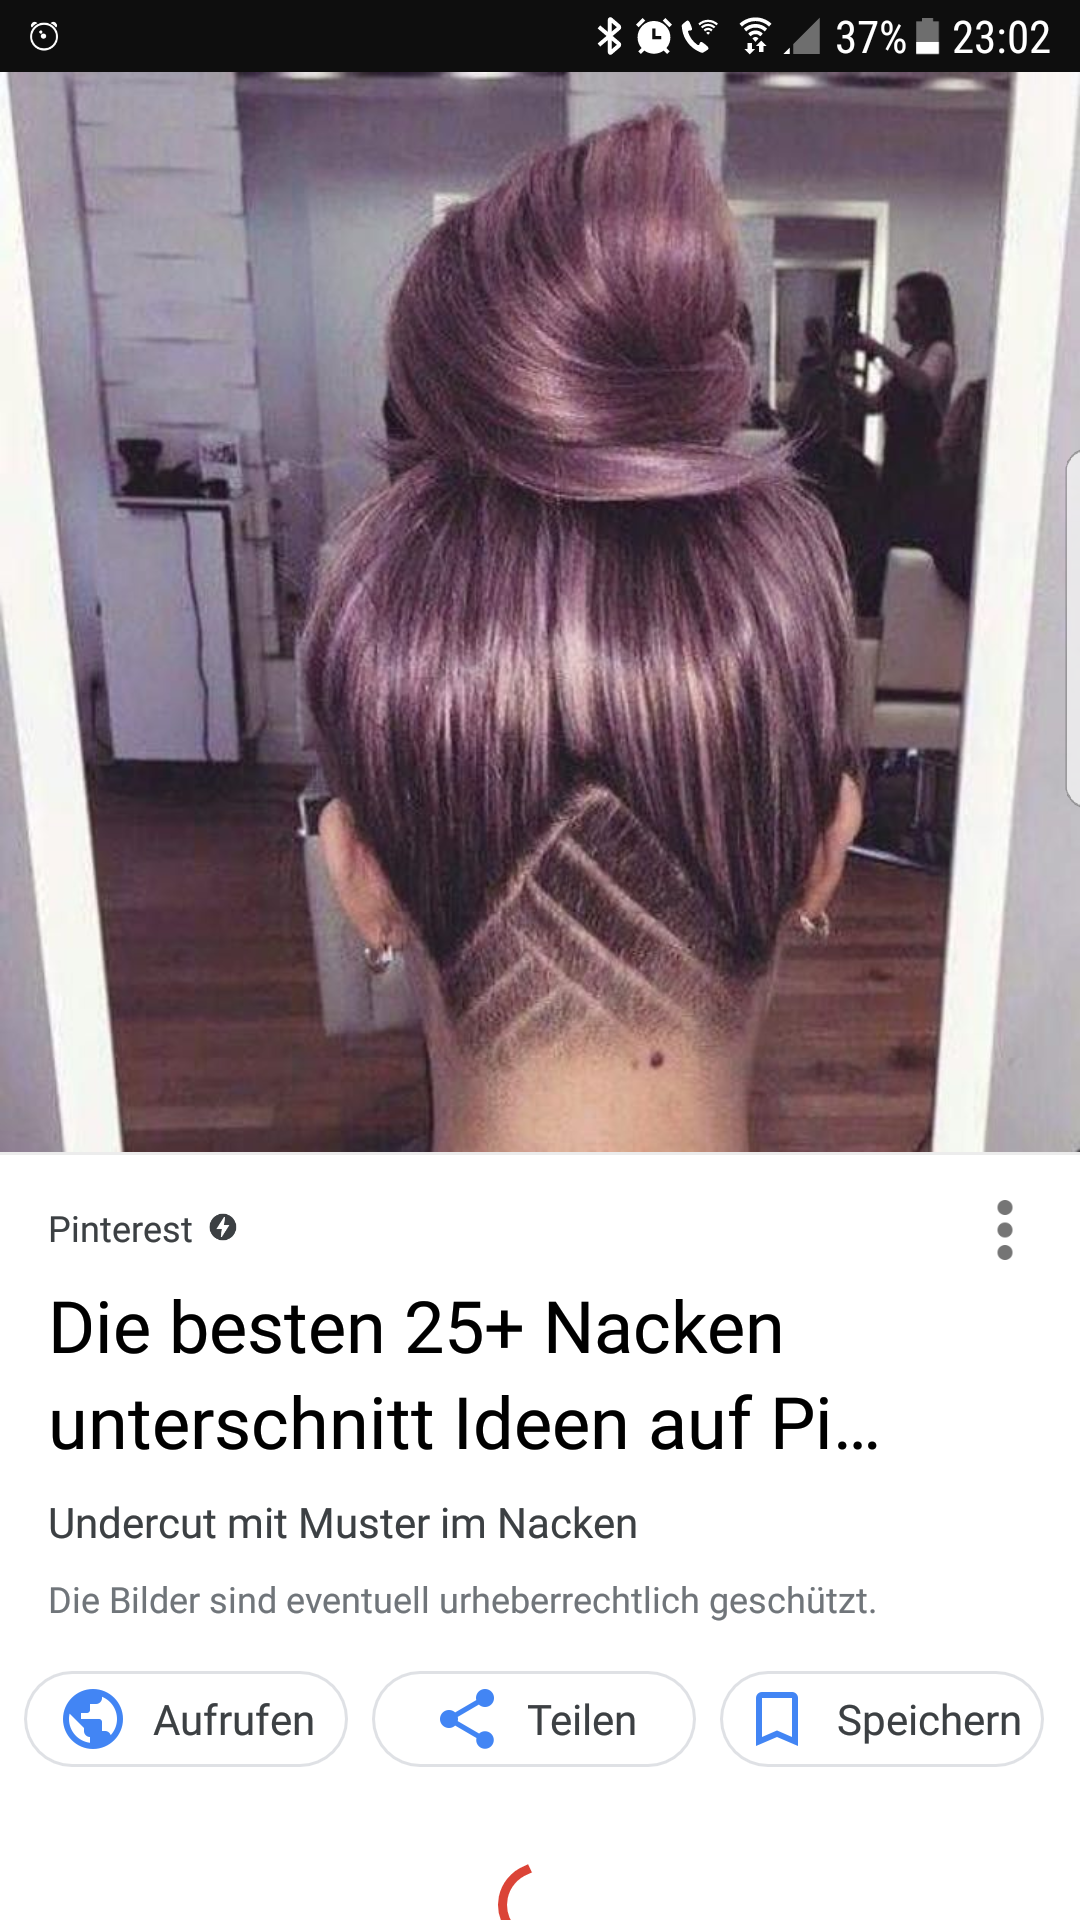 mode frisur undercut - Undercut Frauen Nacken Muster